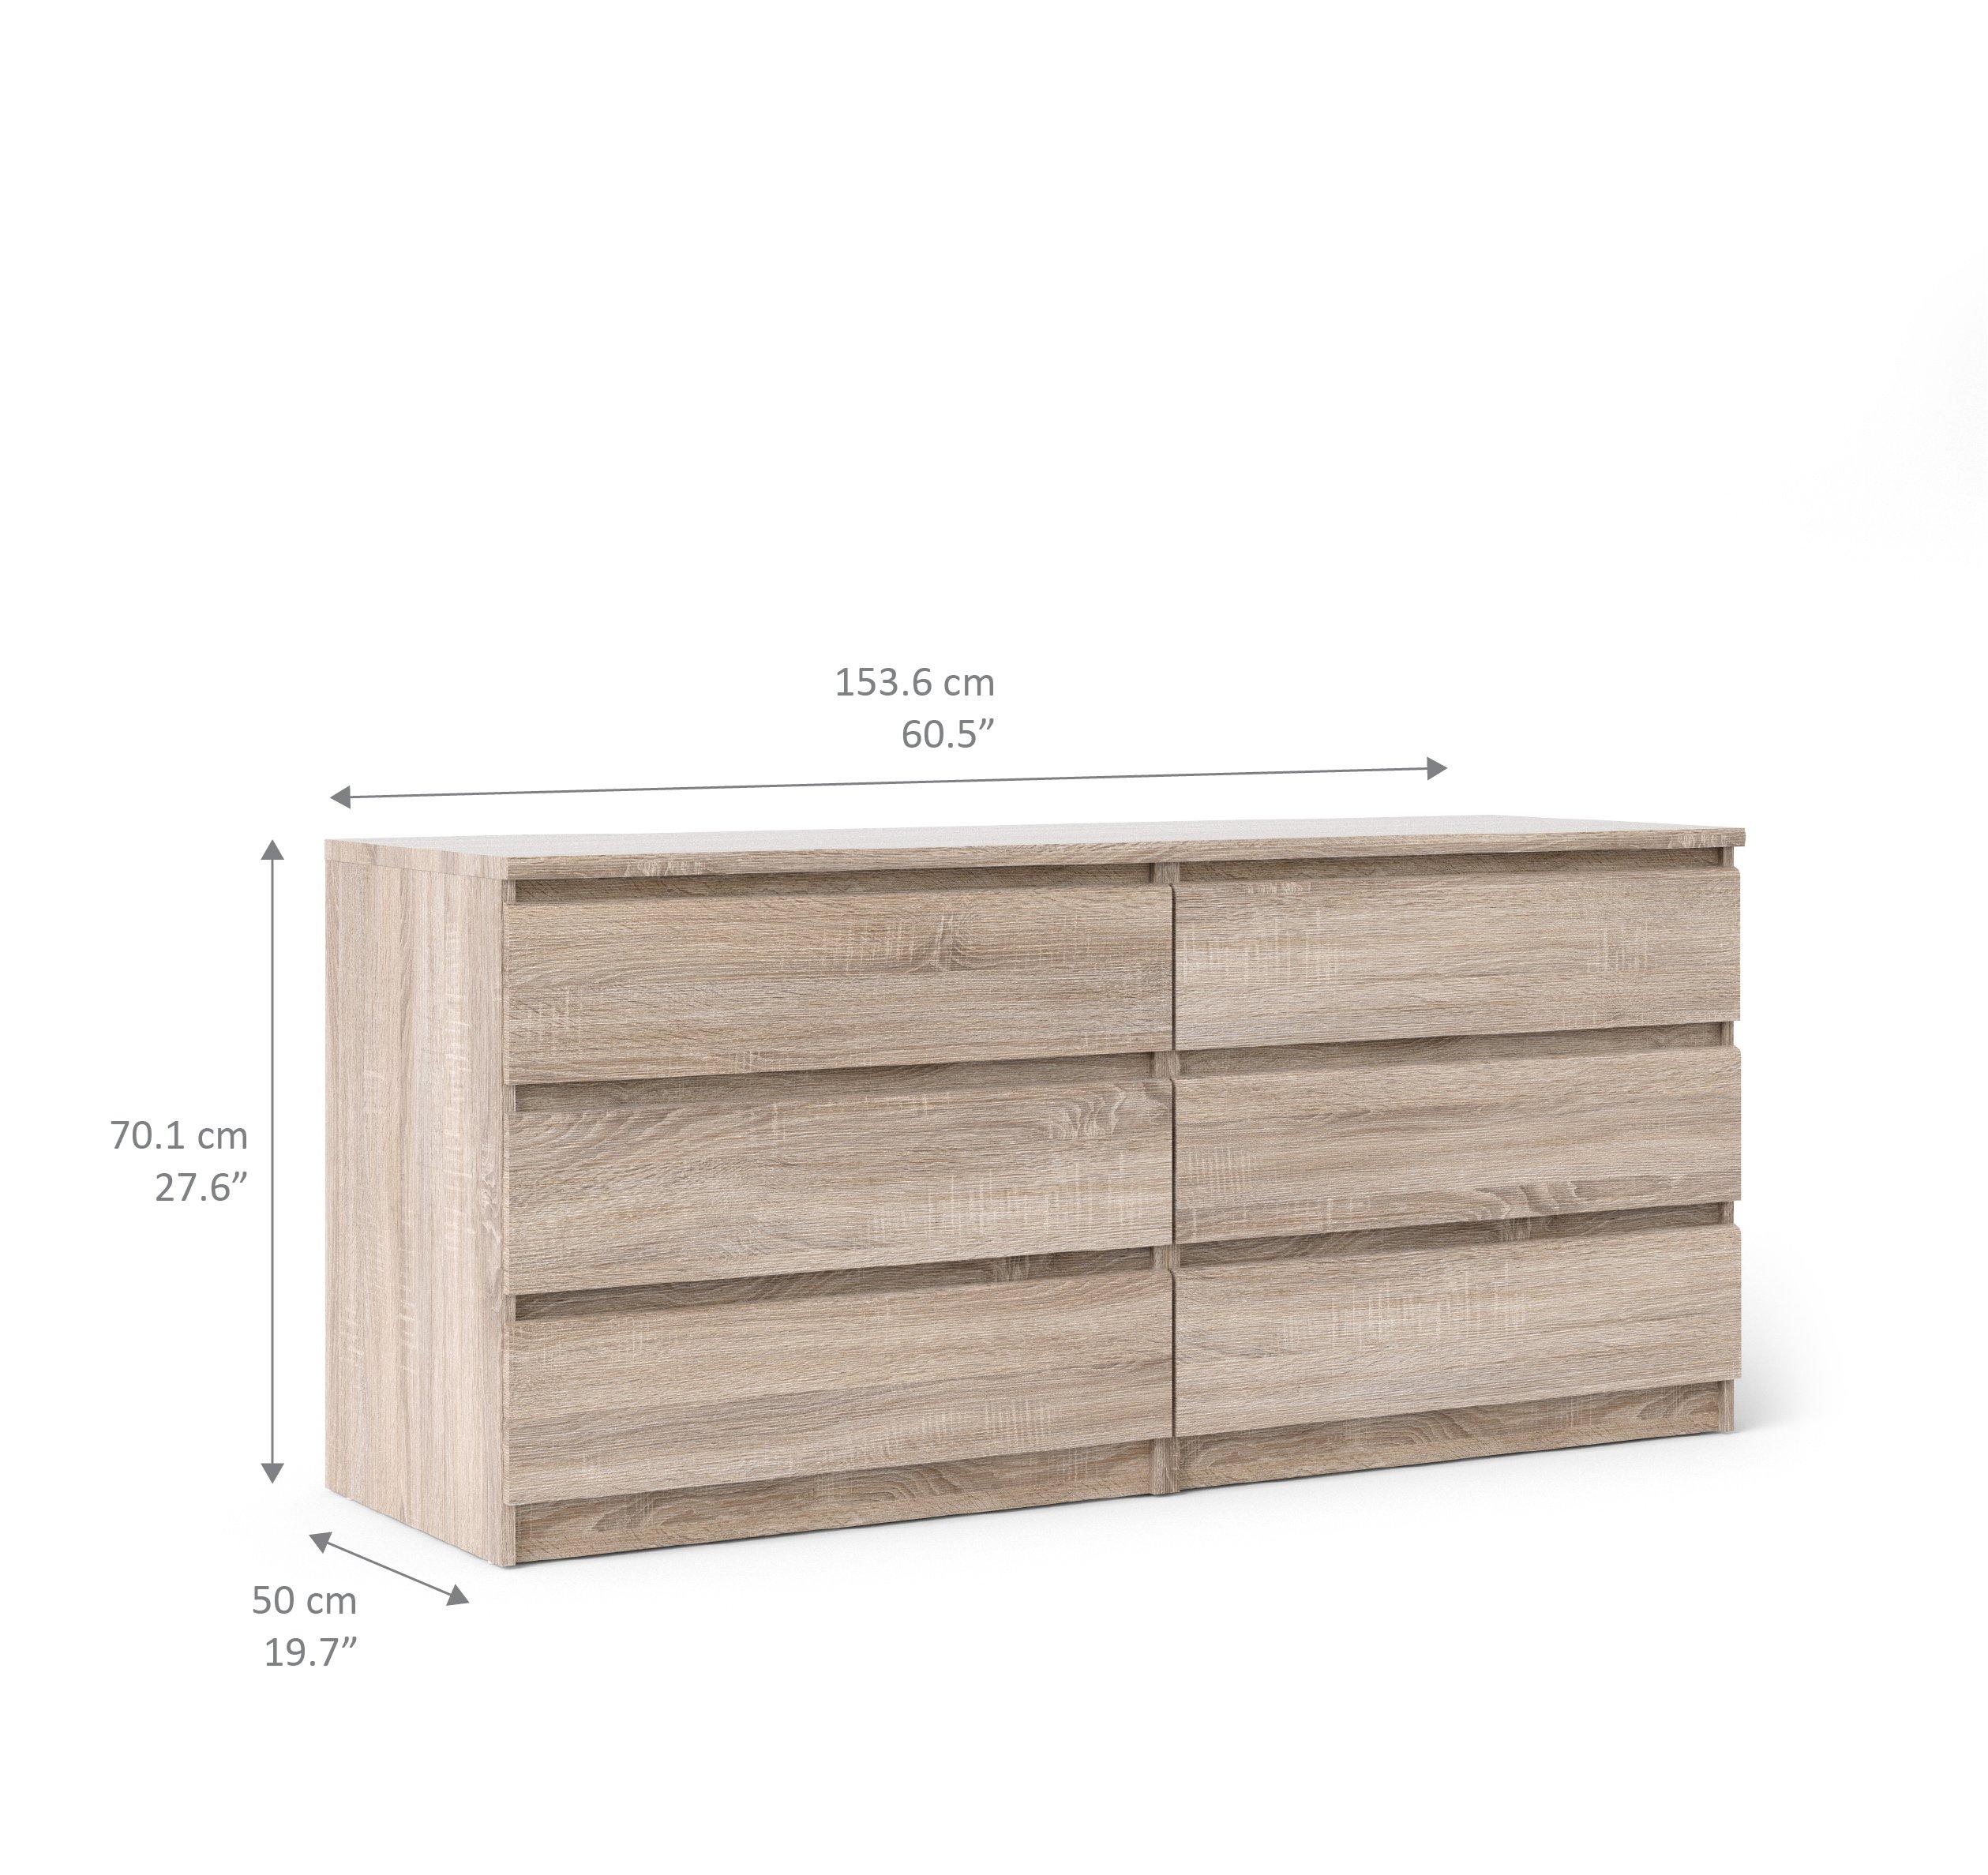 Tvilum 70296cj Scottsdale 6 Drawer Double Dresser, Truffle by Tvilum